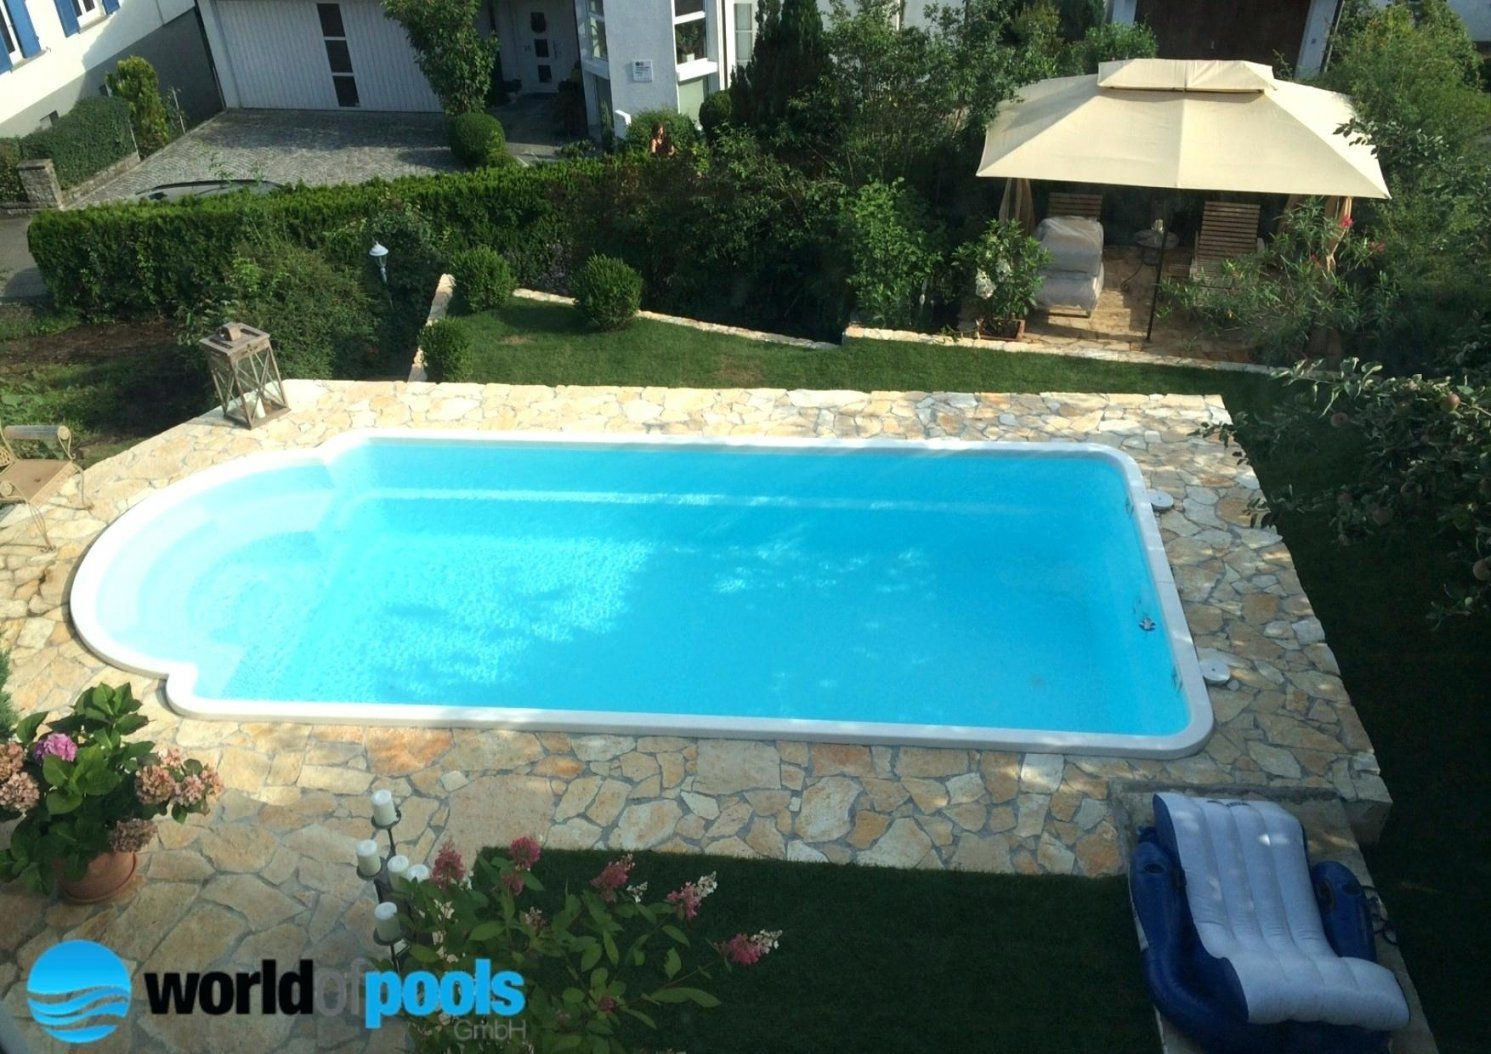 Mini Pool Garten Schwimmbecken Mini Pool Im Garten Bauen Mini Pool von Mini Pool Im Garten Photo